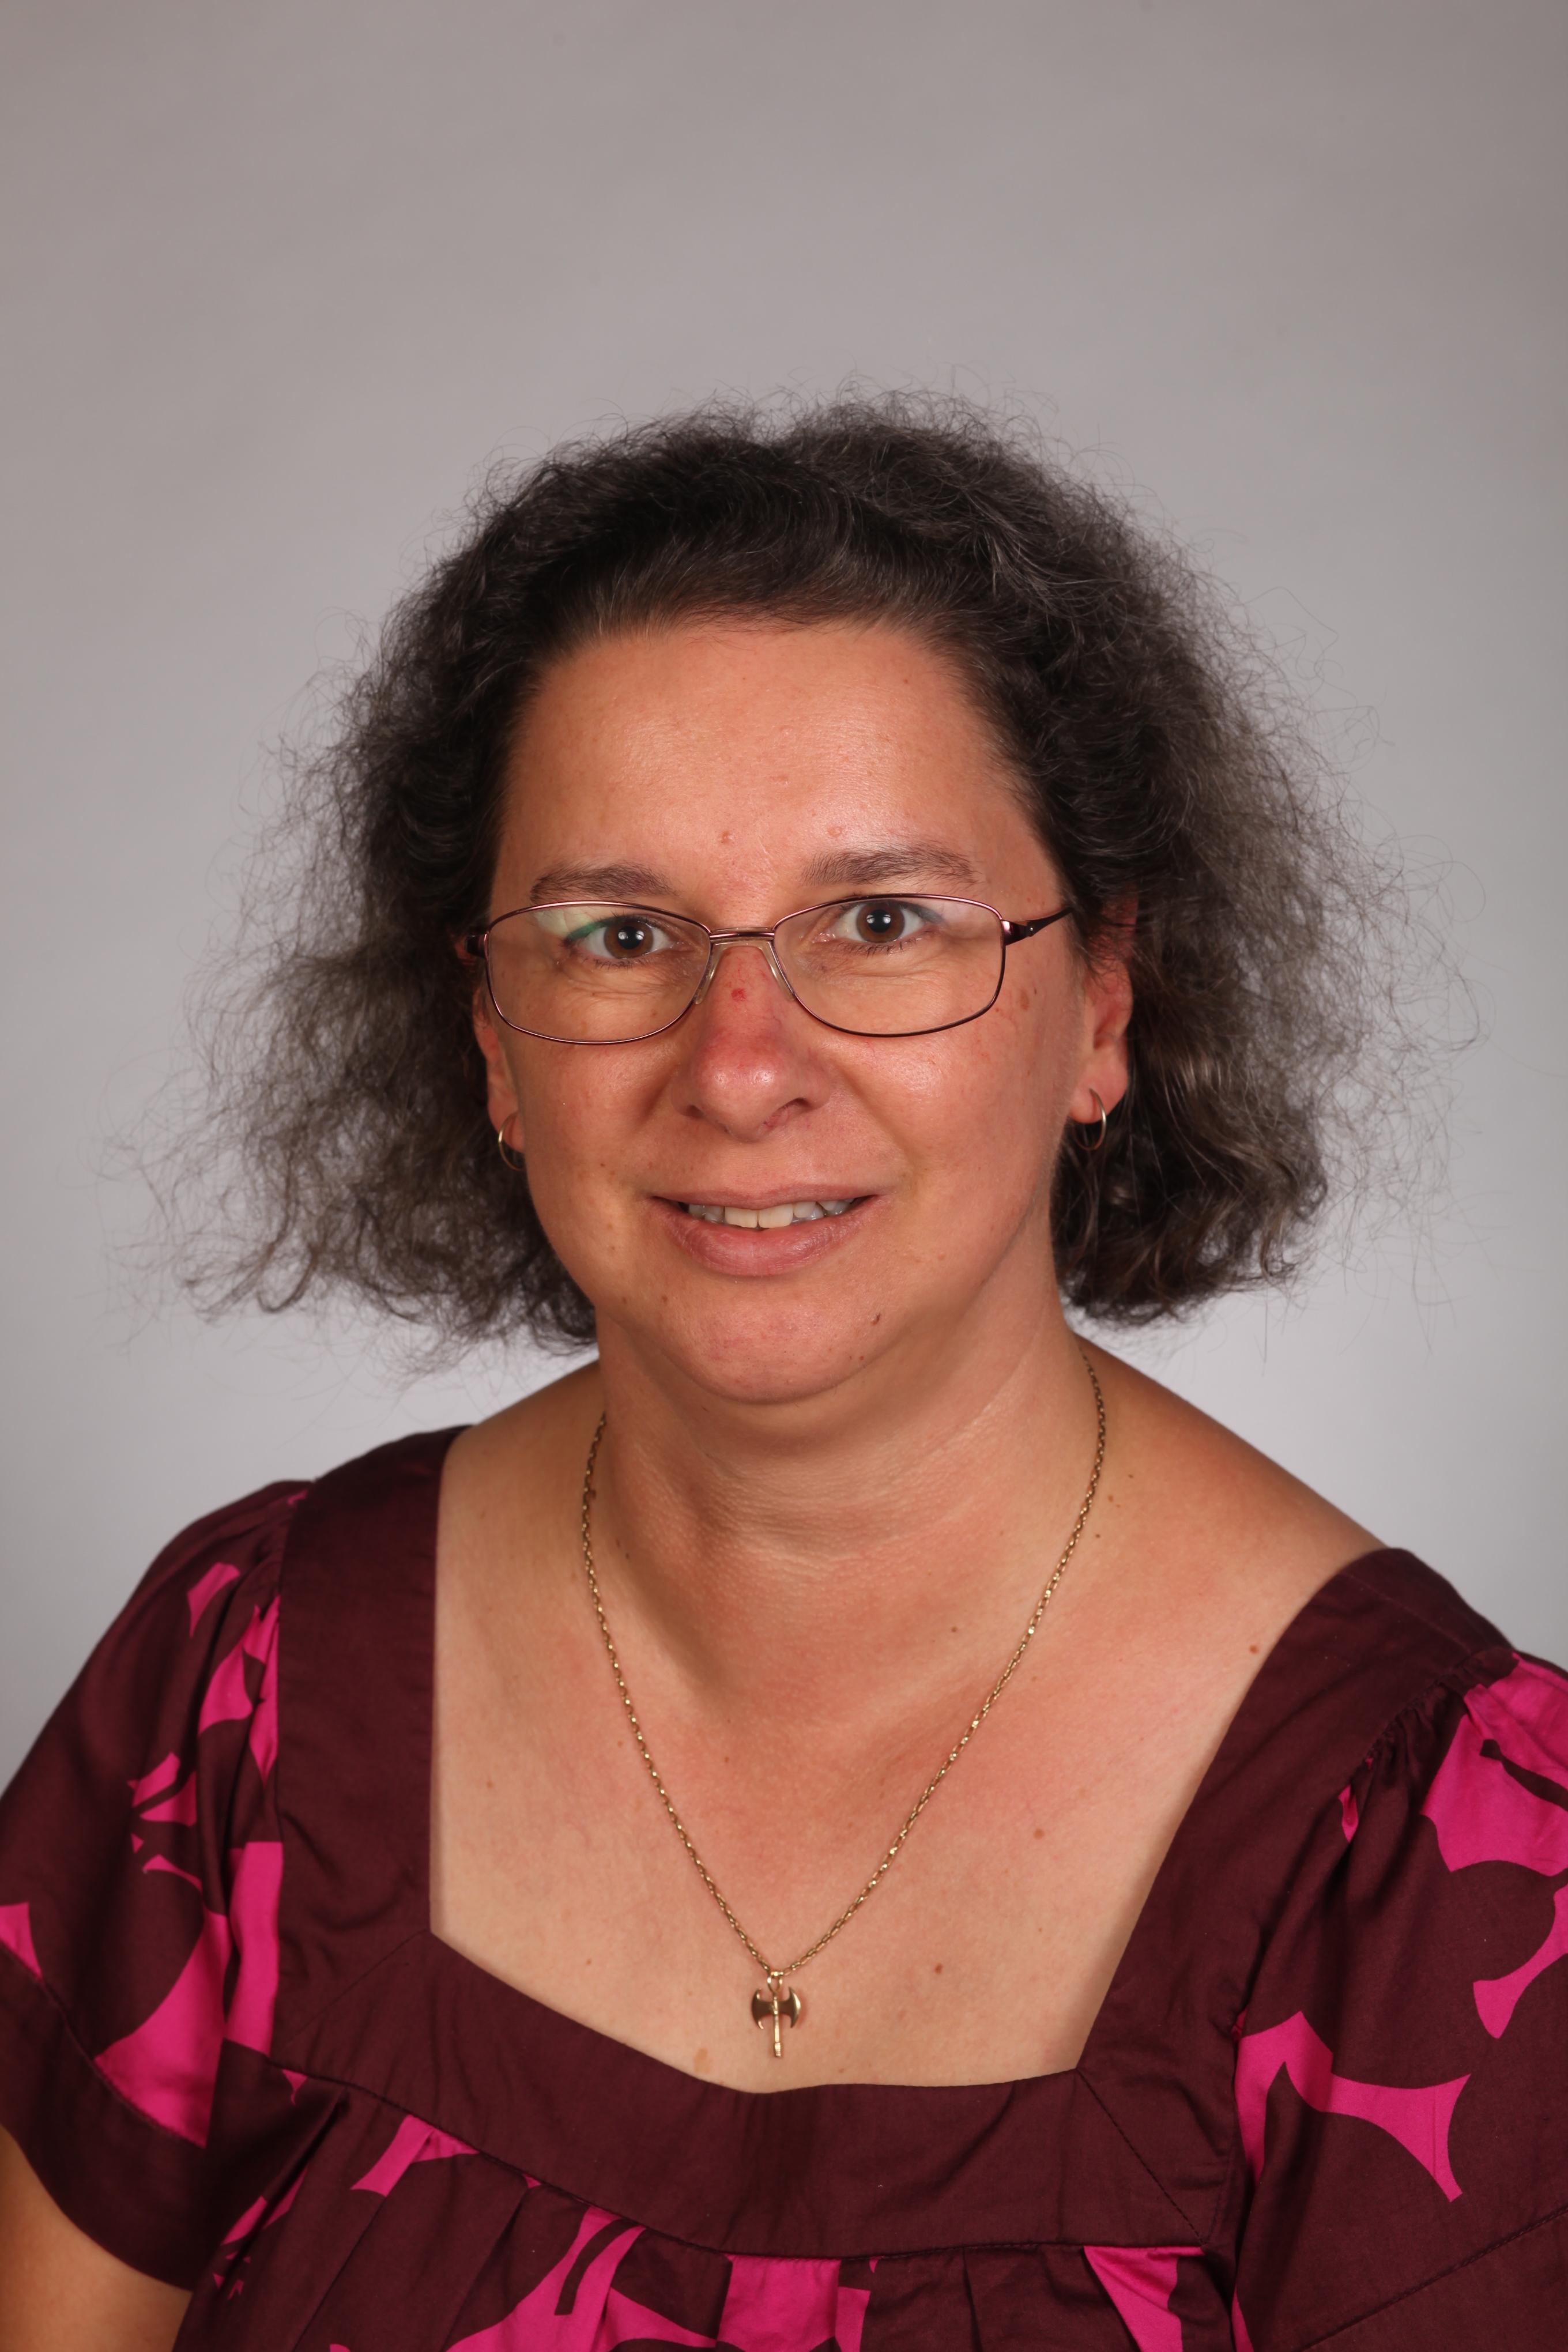 Sonja Ellis